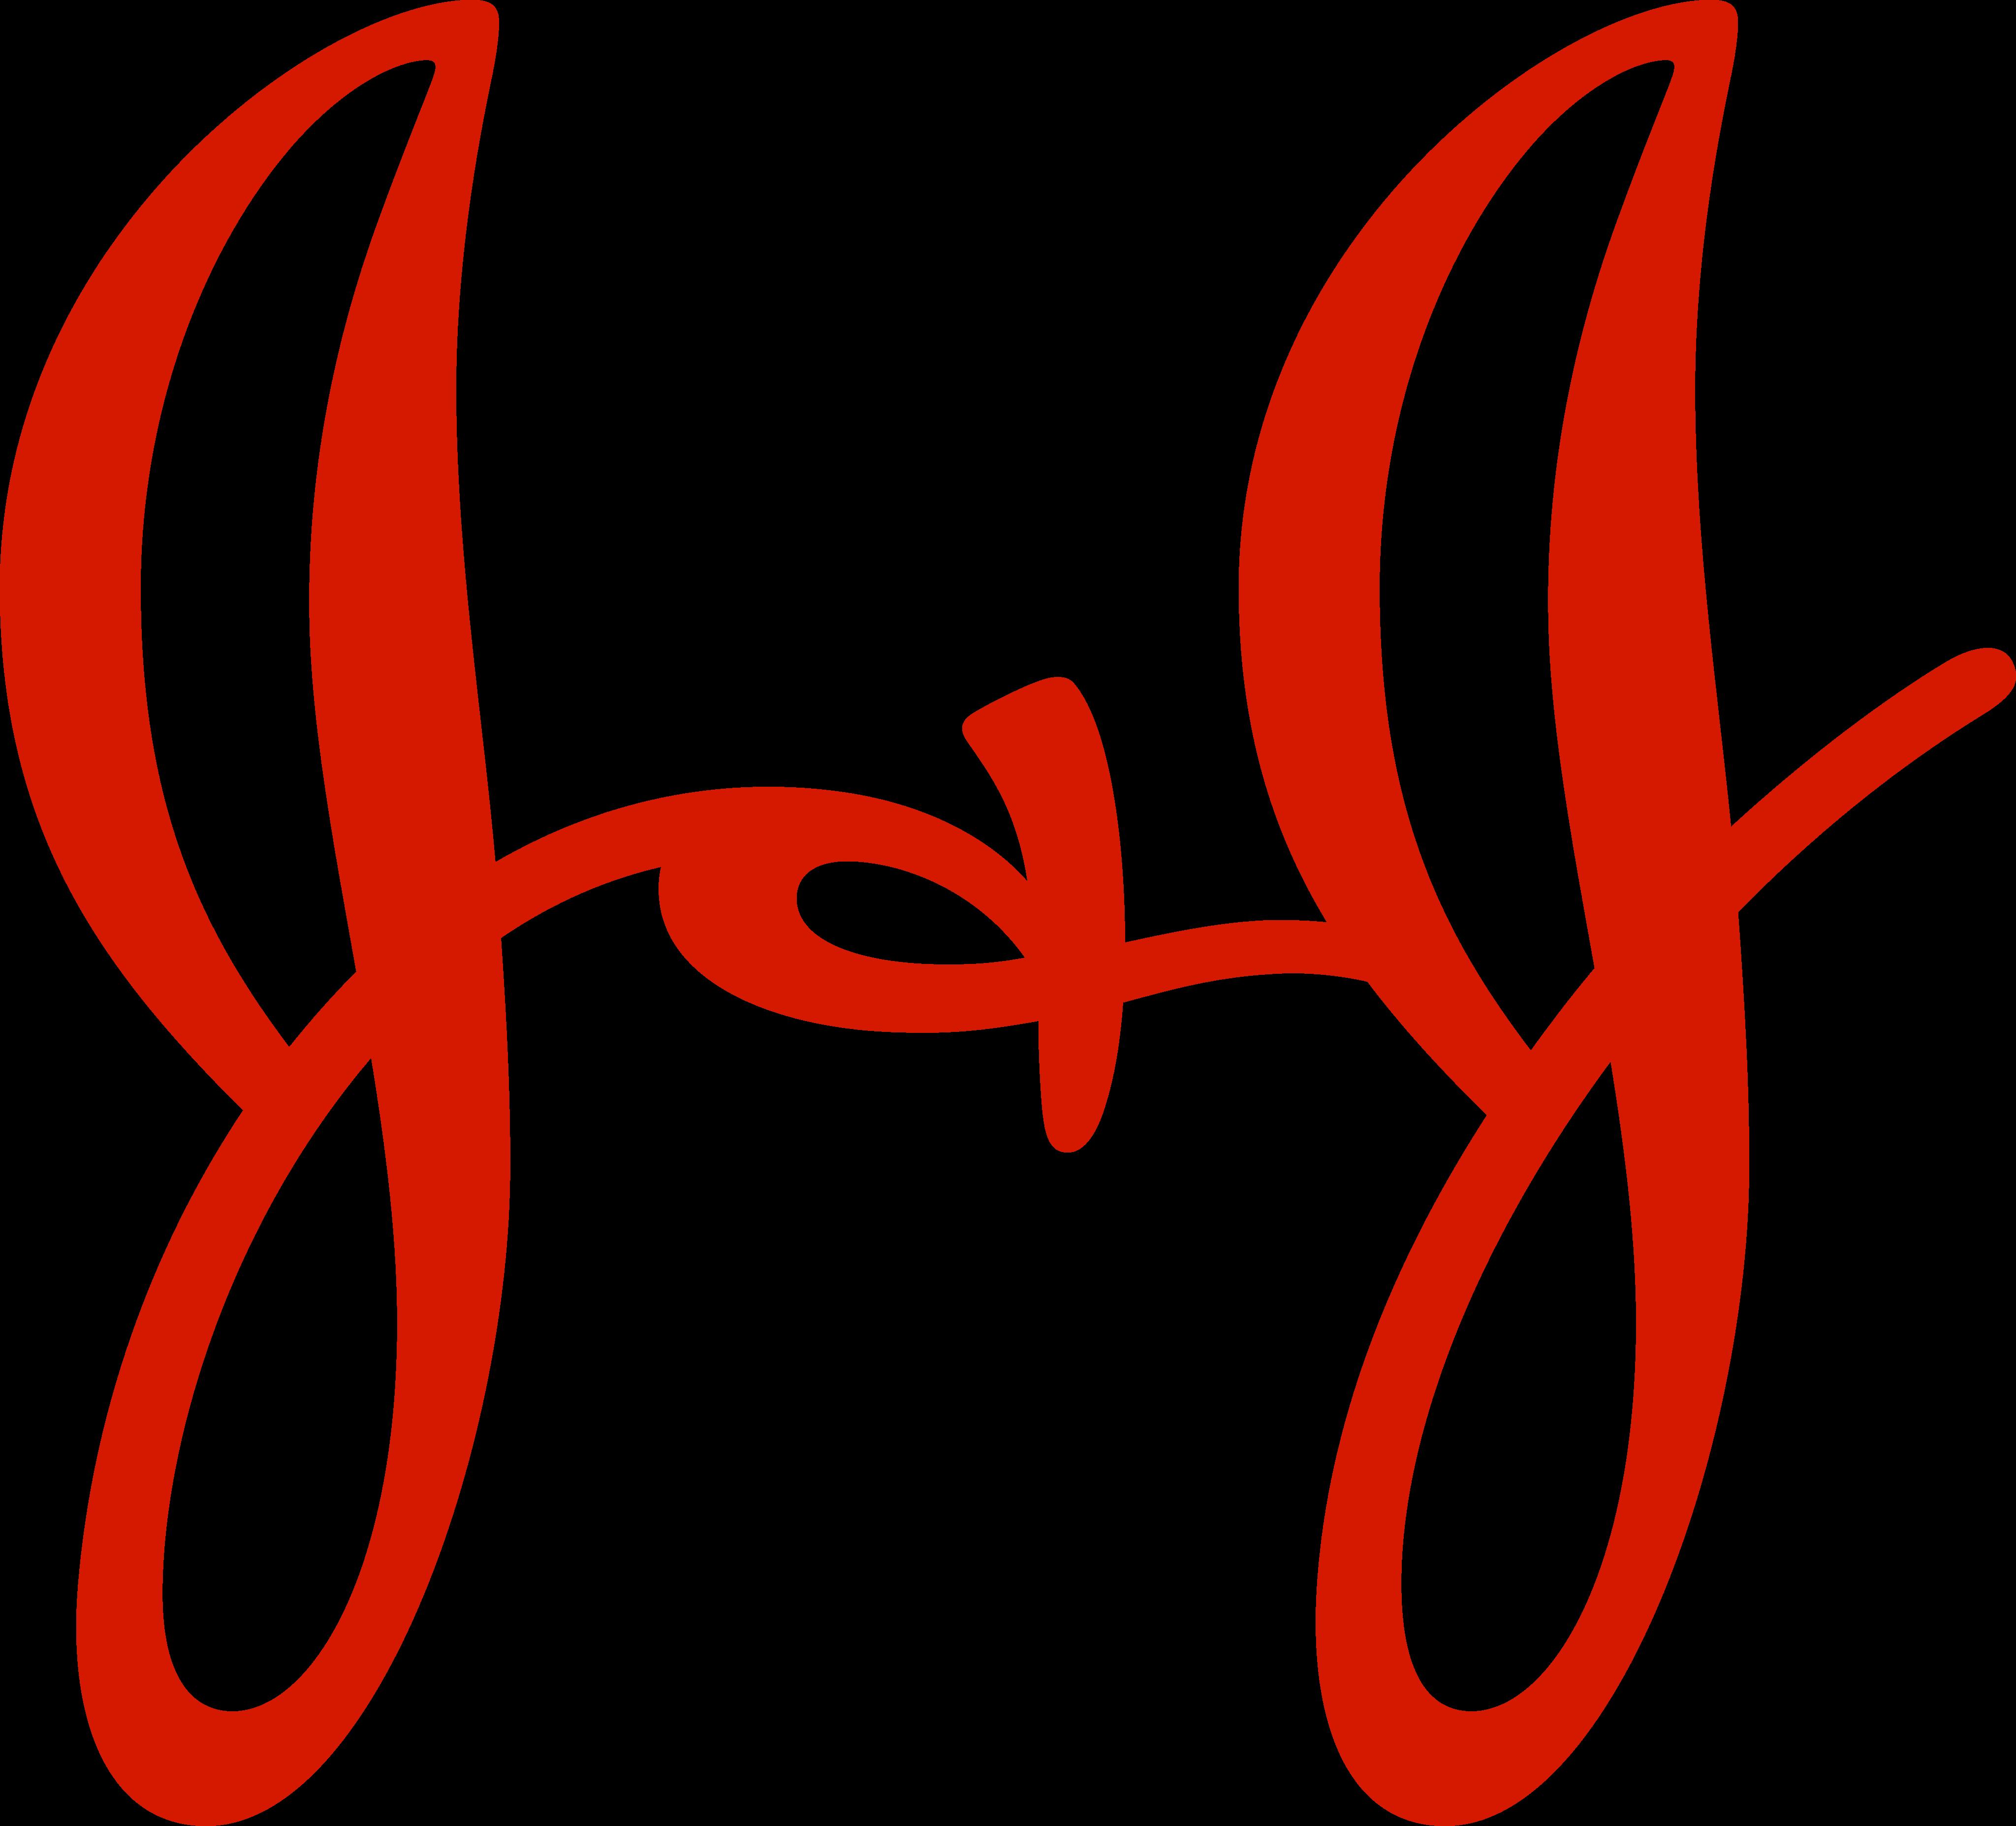 johnson johnson logo 6 - Johnson & Johnson Logo